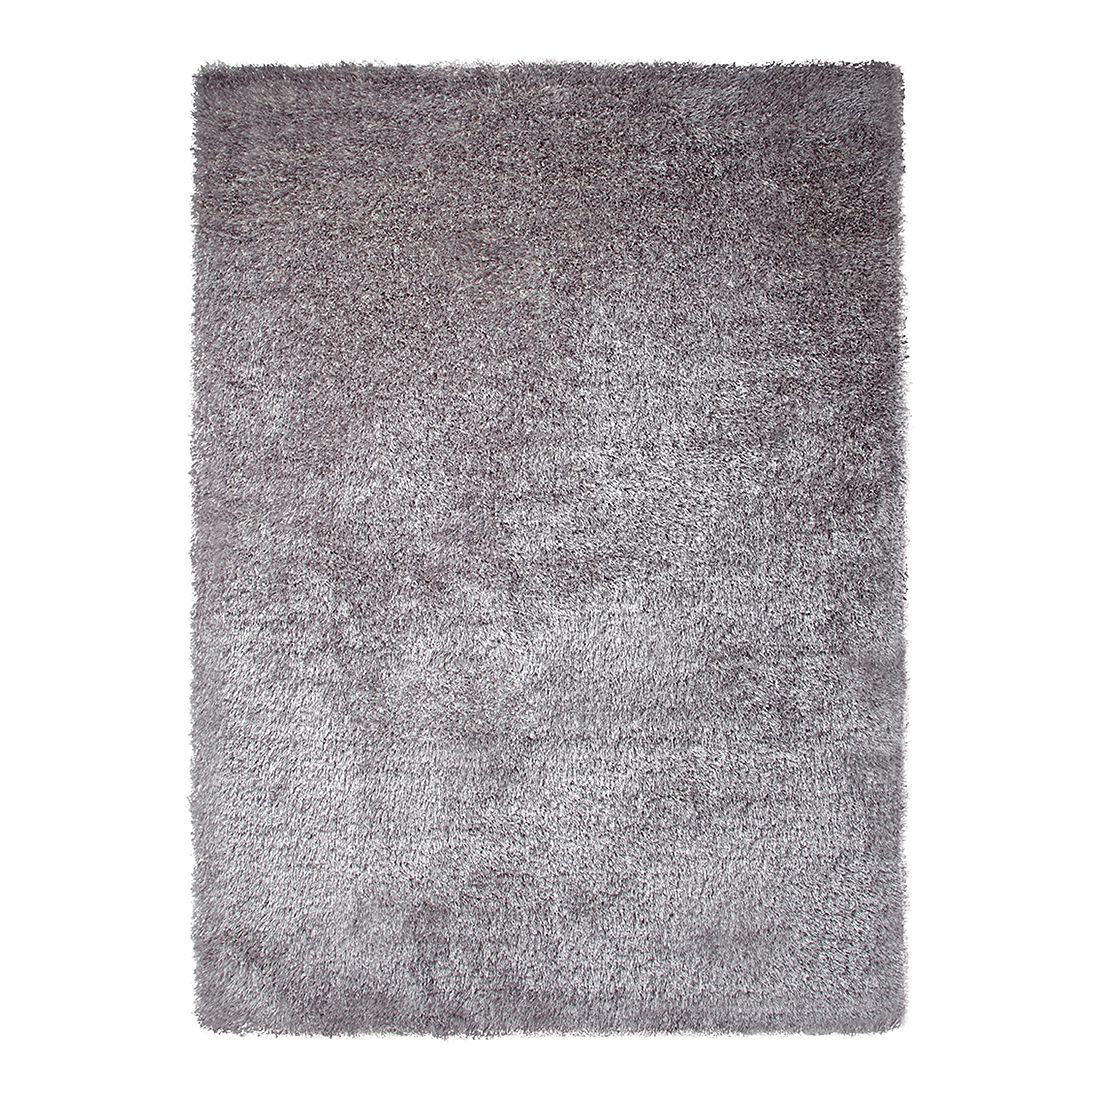 Teppich New Glamour- Silbergrau – 170 cm x 240 cm, Esprit Home kaufen